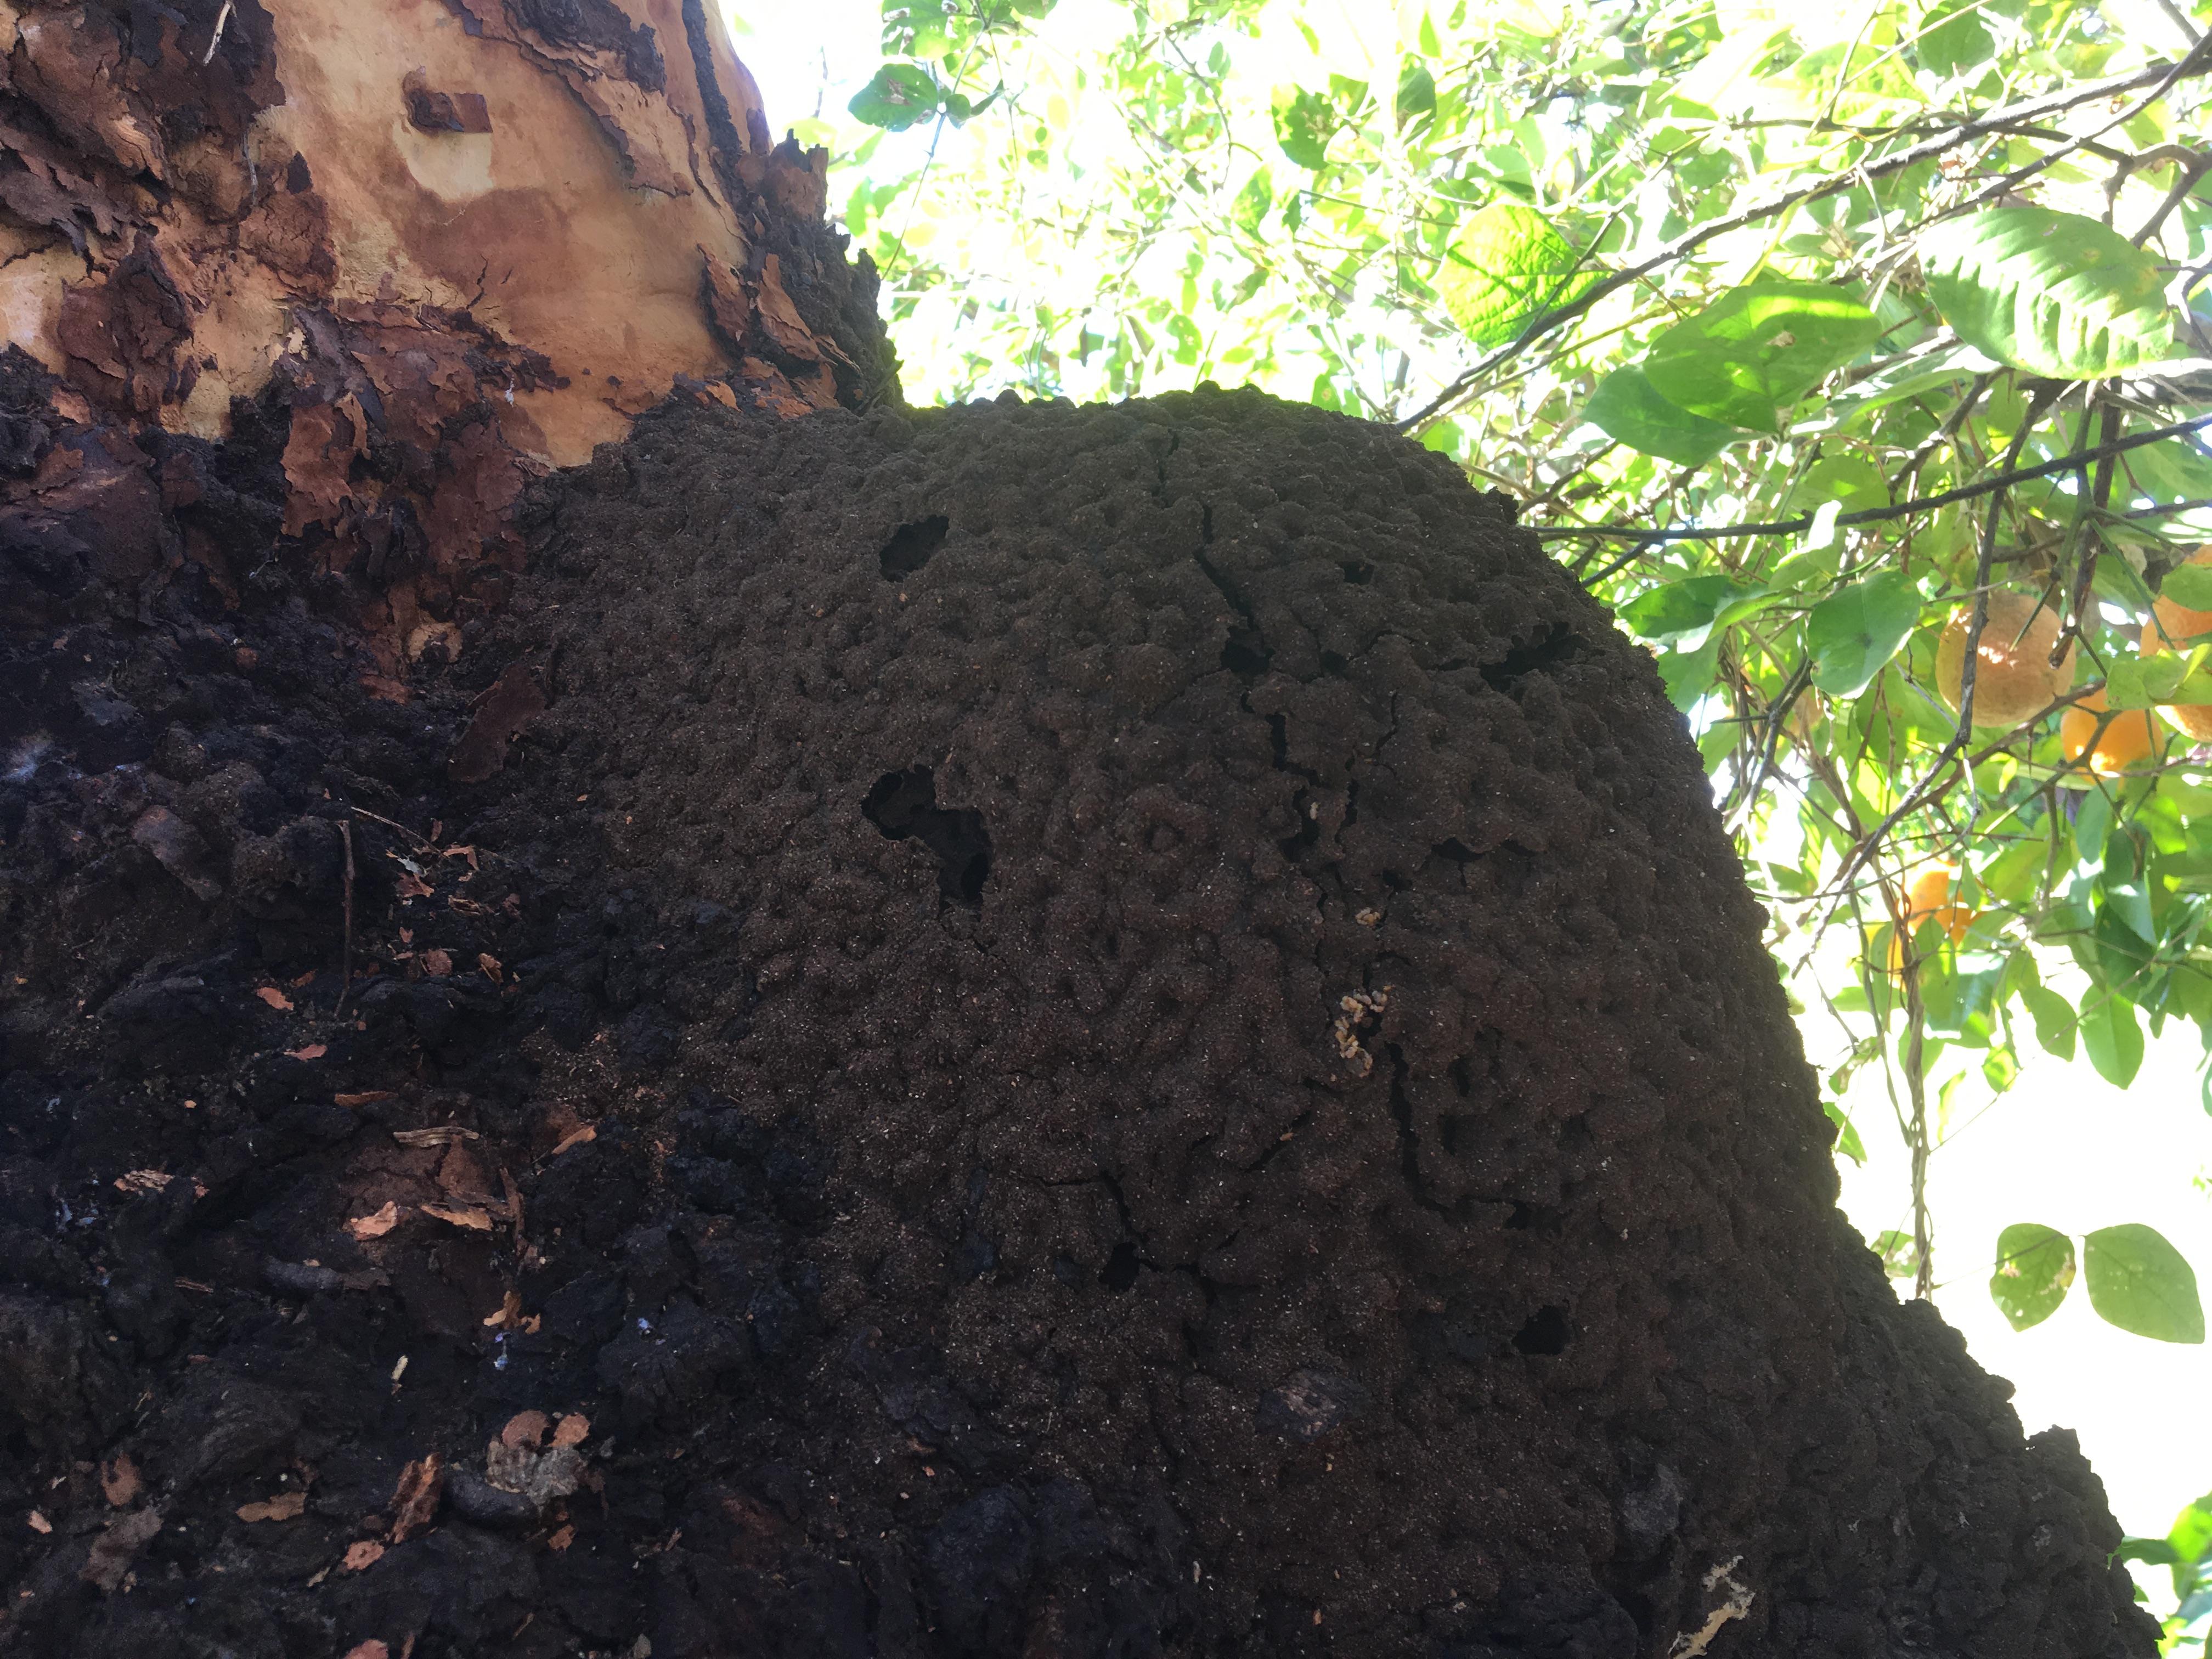 Termite nest - Nausititermes nest in a tree